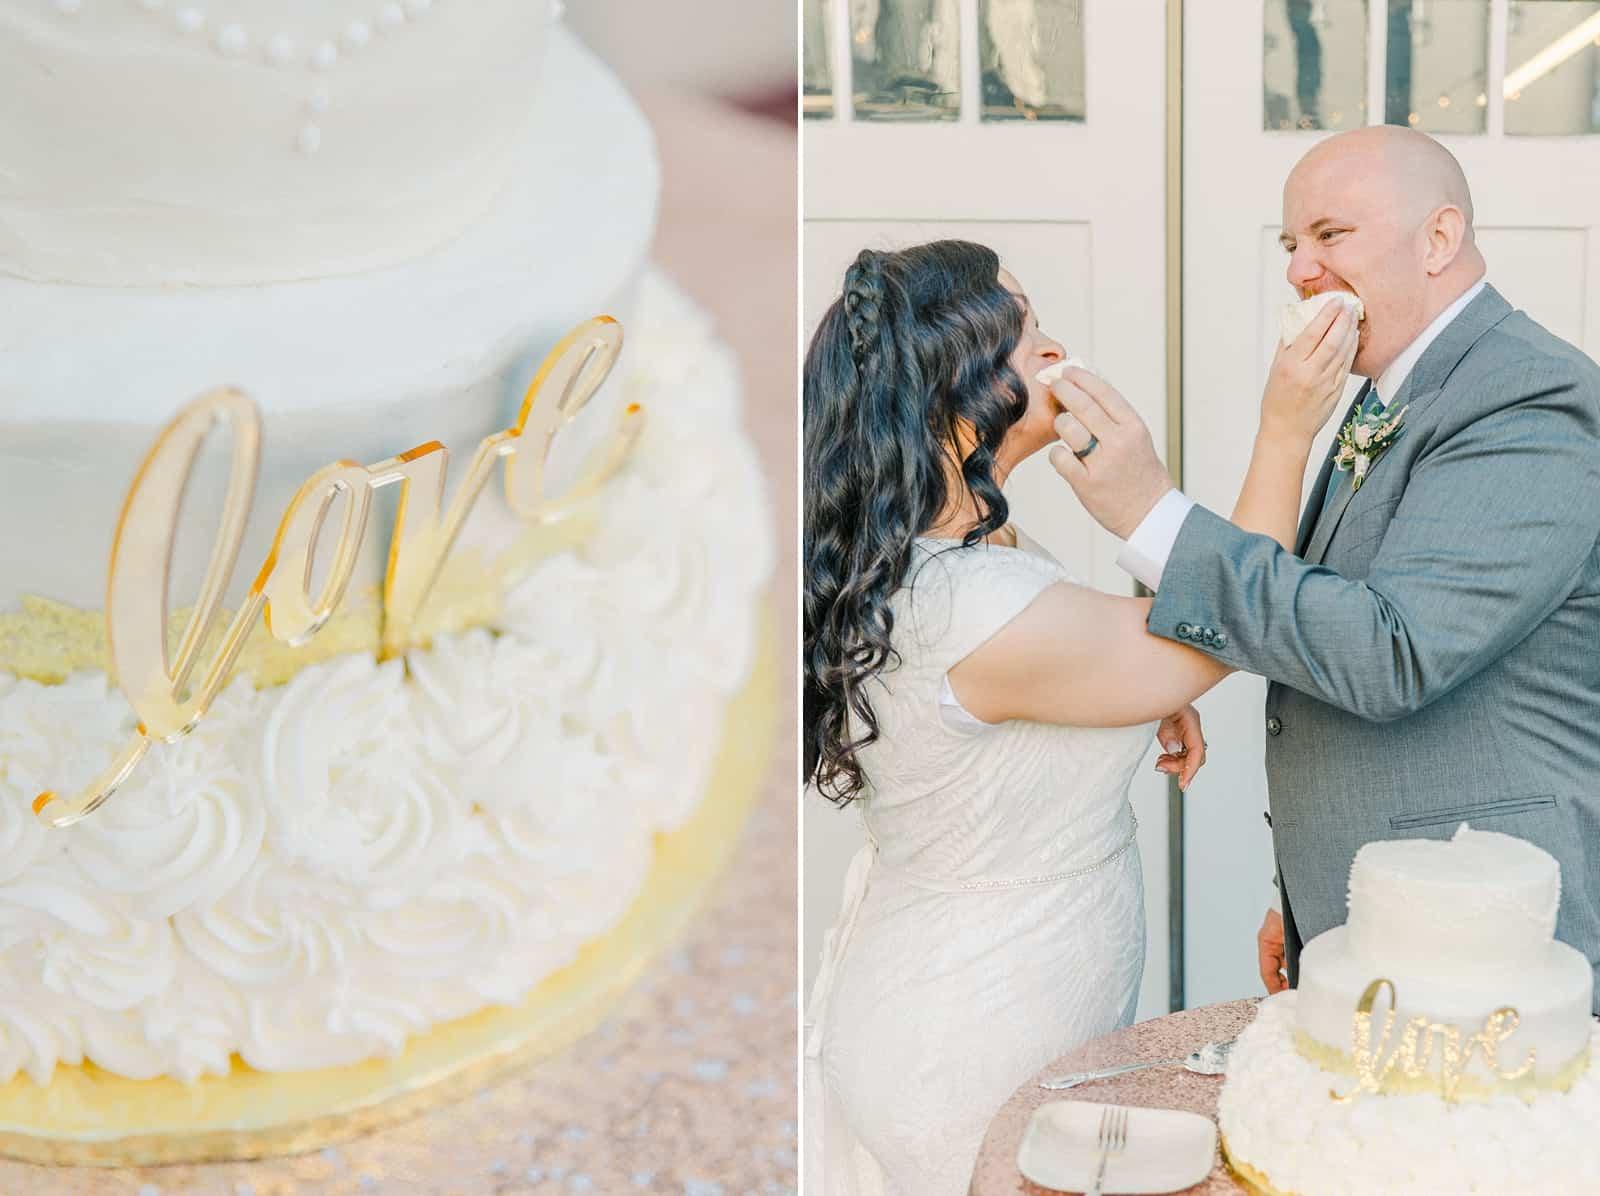 Thomas S. Monson Center Wedding, Salt Lake LDS Temple Wedding, Utah wedding photography. bride and groom cut cake